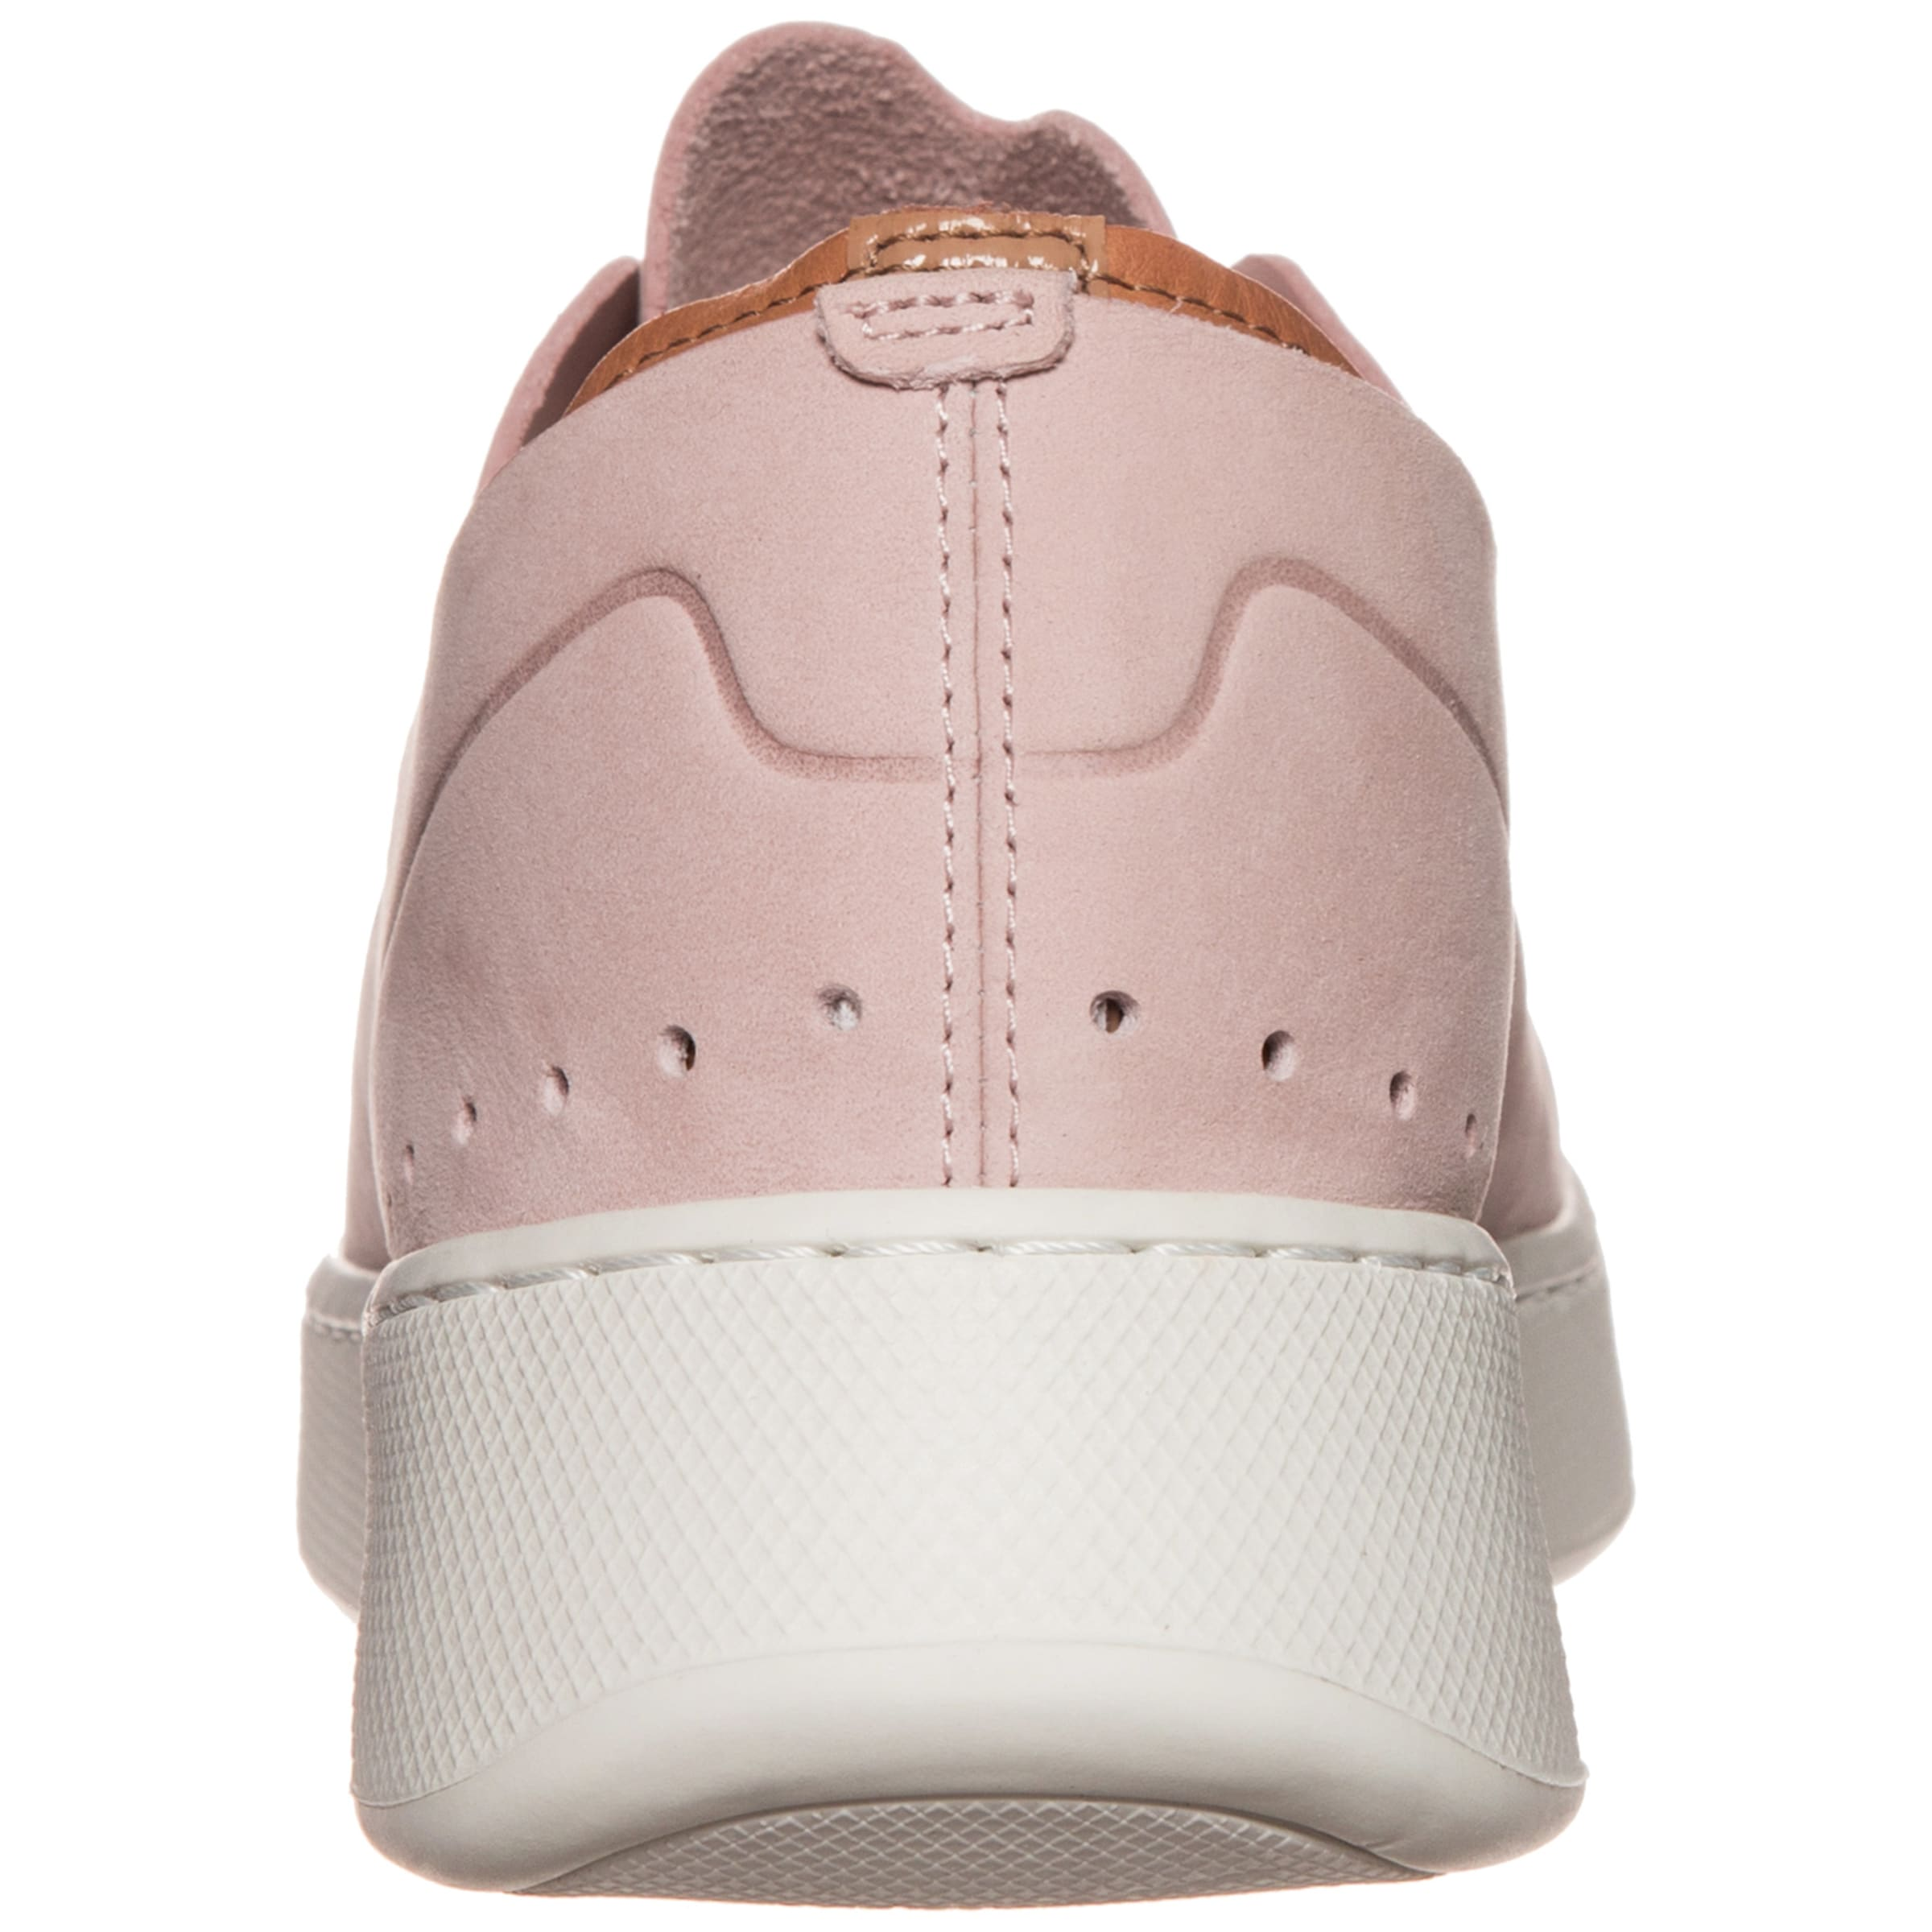 LACOSTE 'Eyyla' Sneaker Damen Billig Bestseller 2018 Unisex Online Outlet-Store Online bpzTo7iXGT